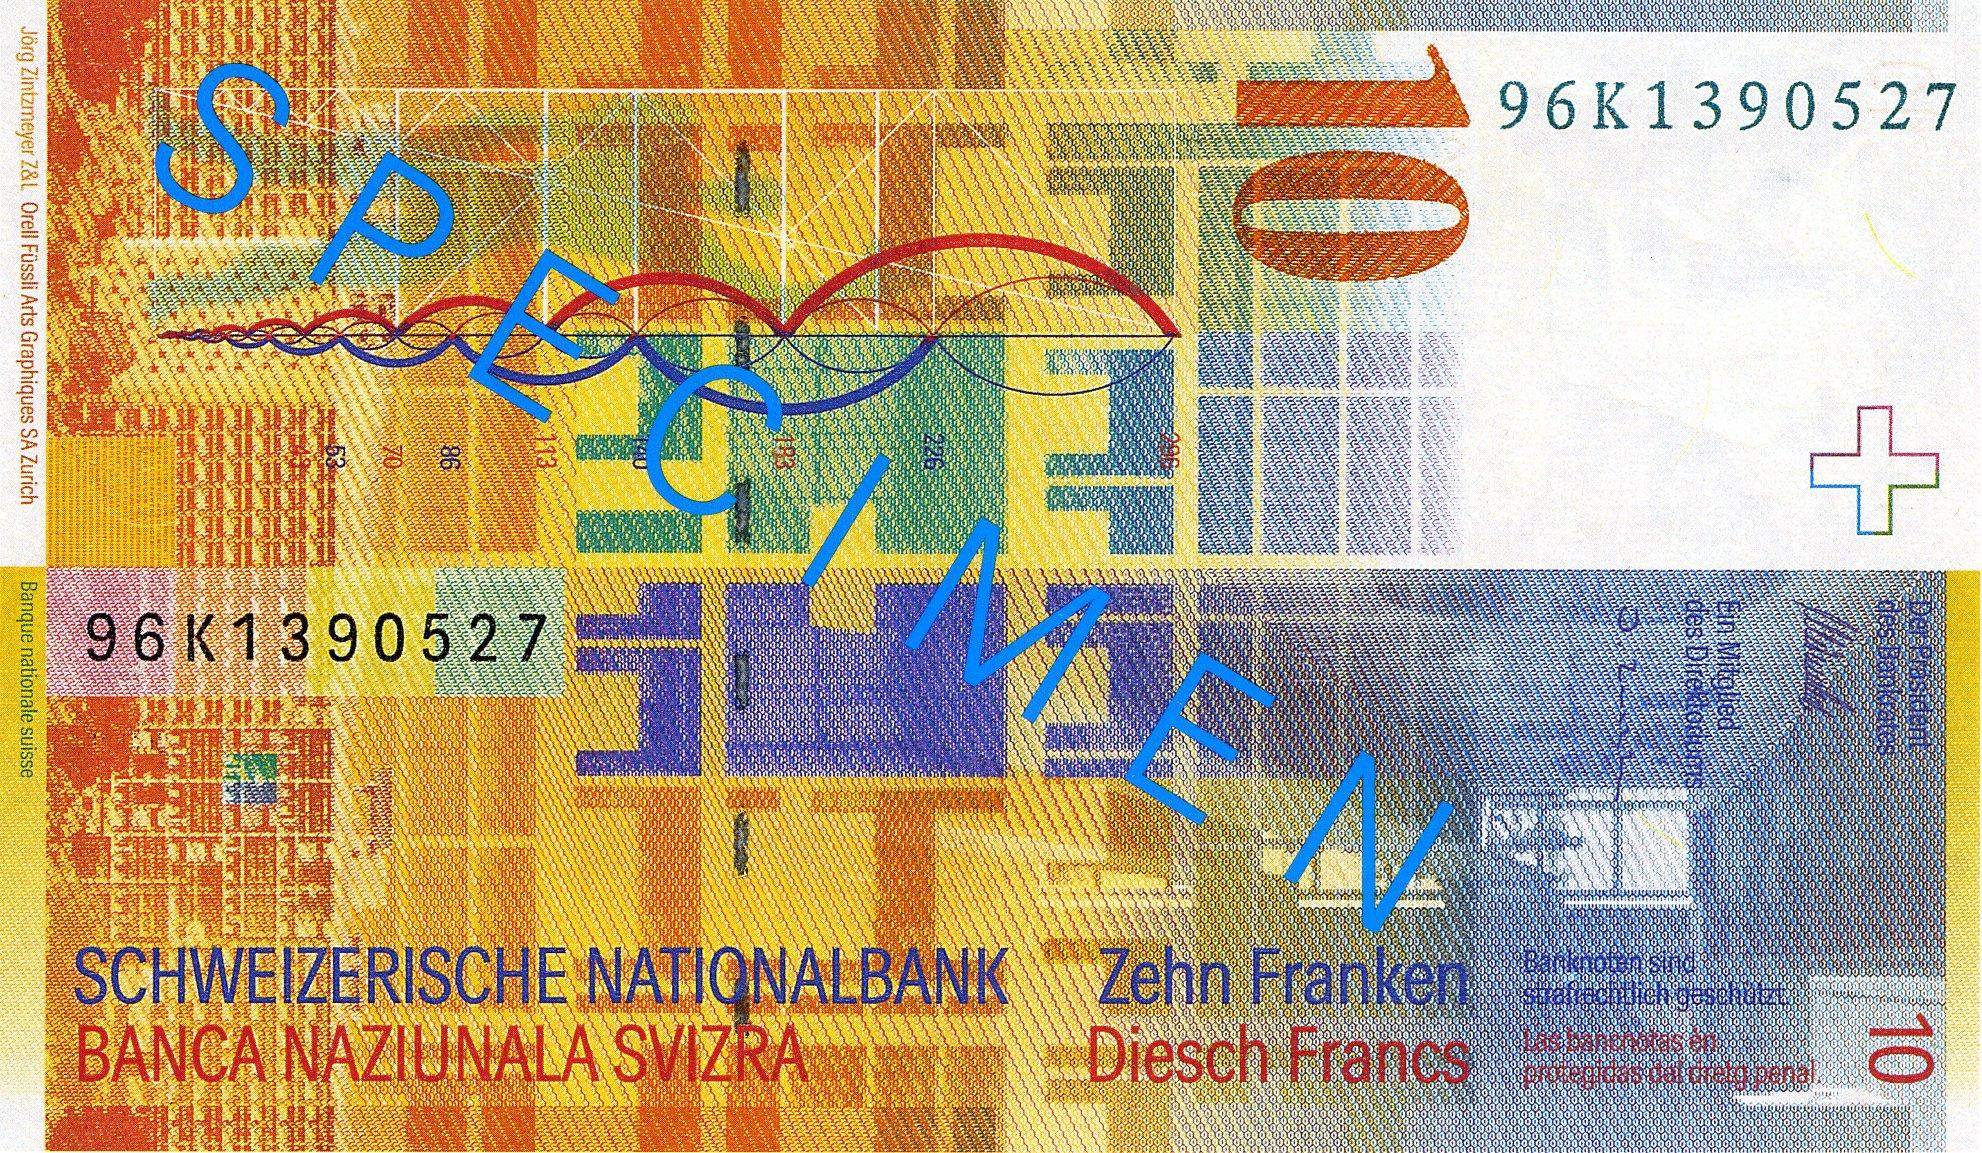 EURCHF Wave Analysis 6 October, 2020